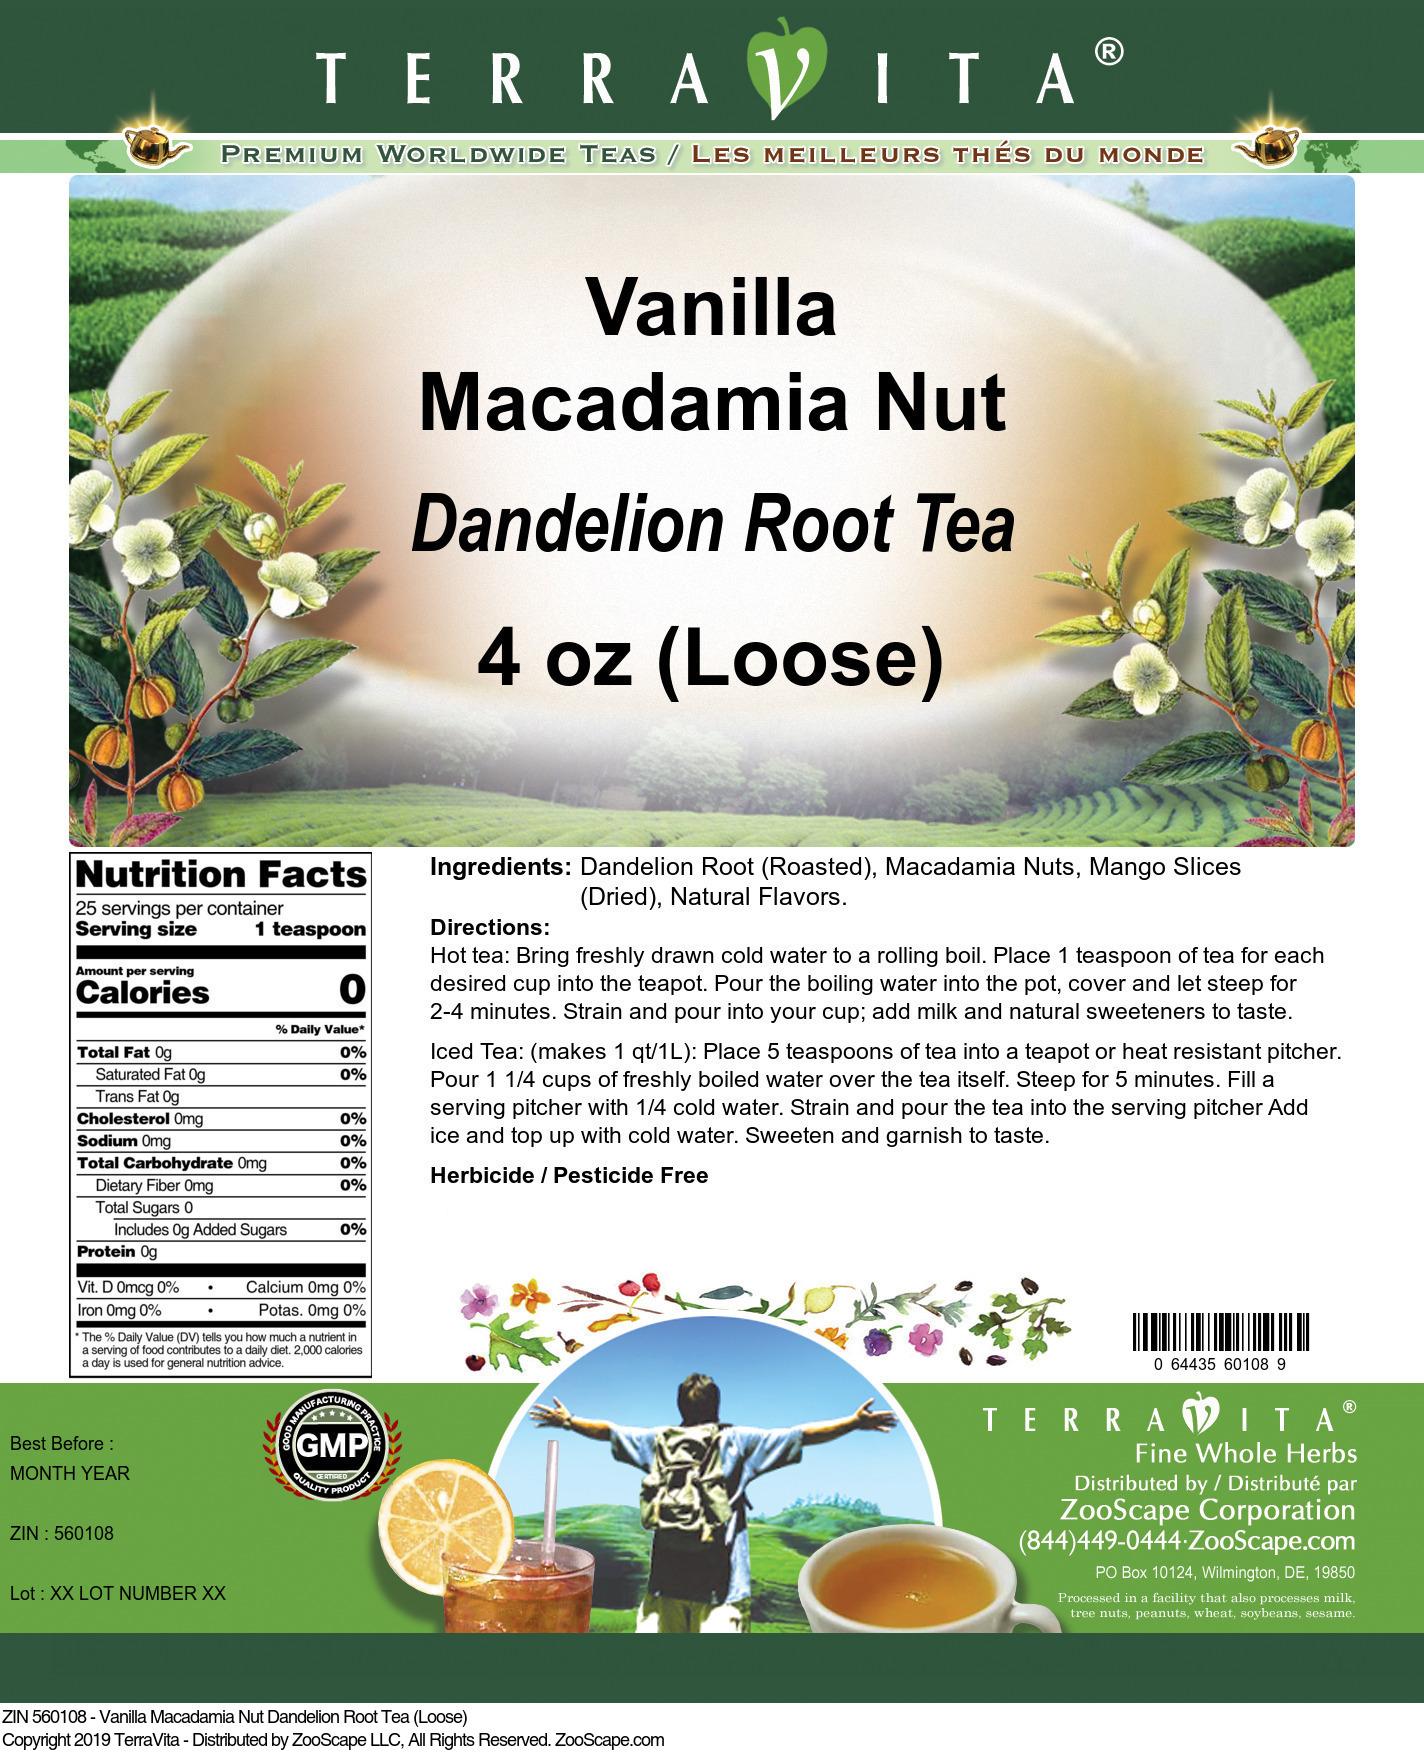 Vanilla Macadamia Nut Dandelion Root Tea (Loose)